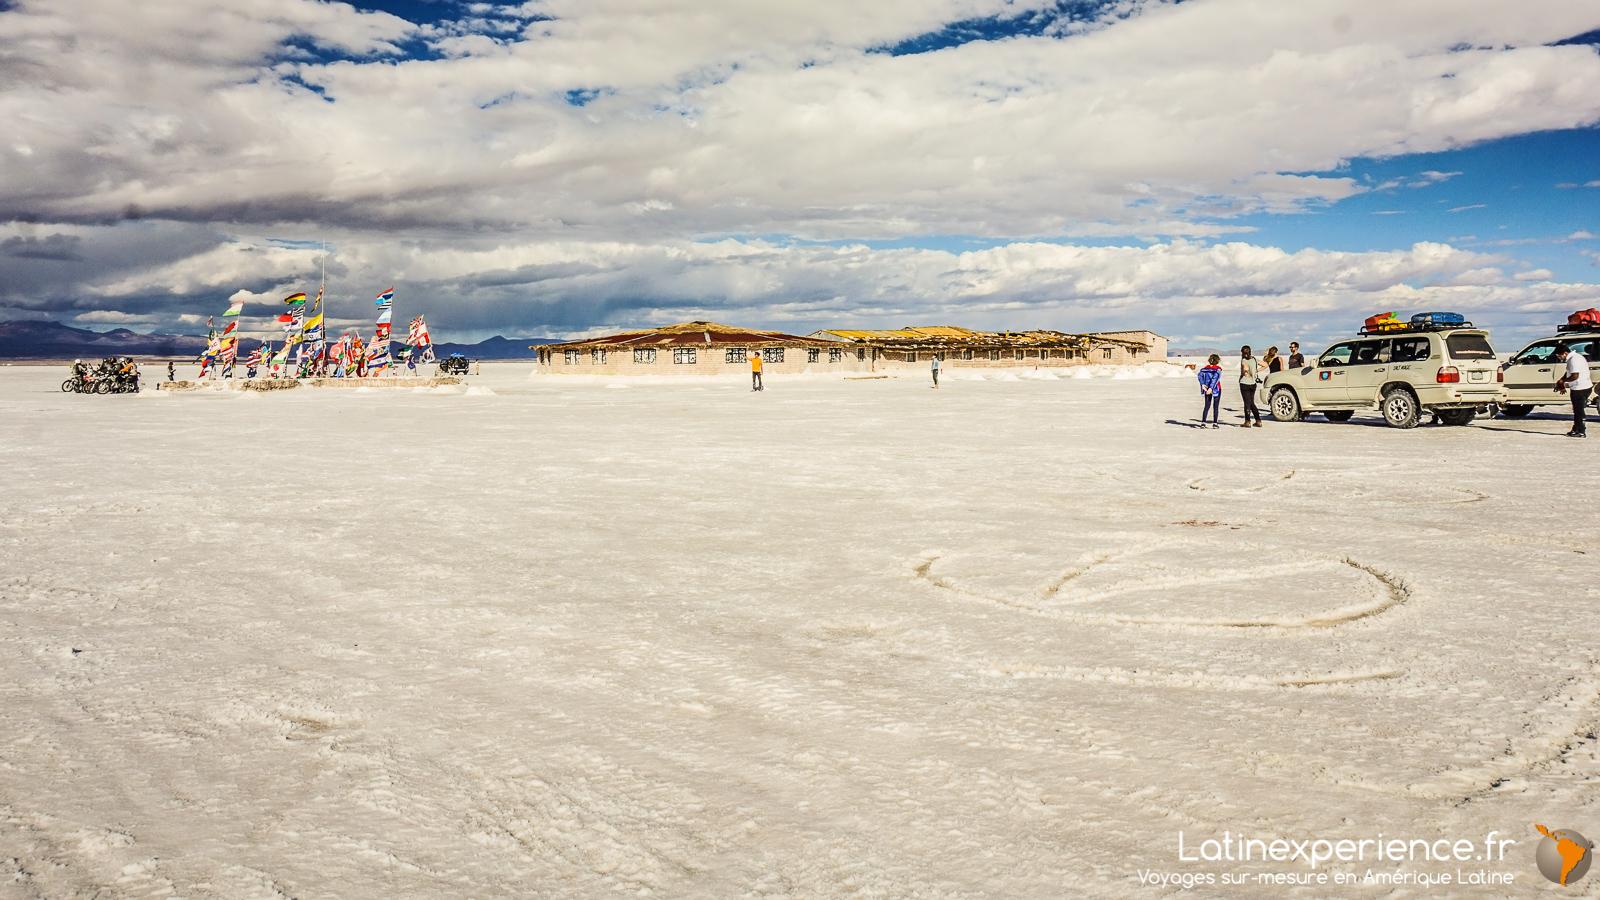 Bolivie - road trip - Salar de Uyuni - Latinexperience voyages